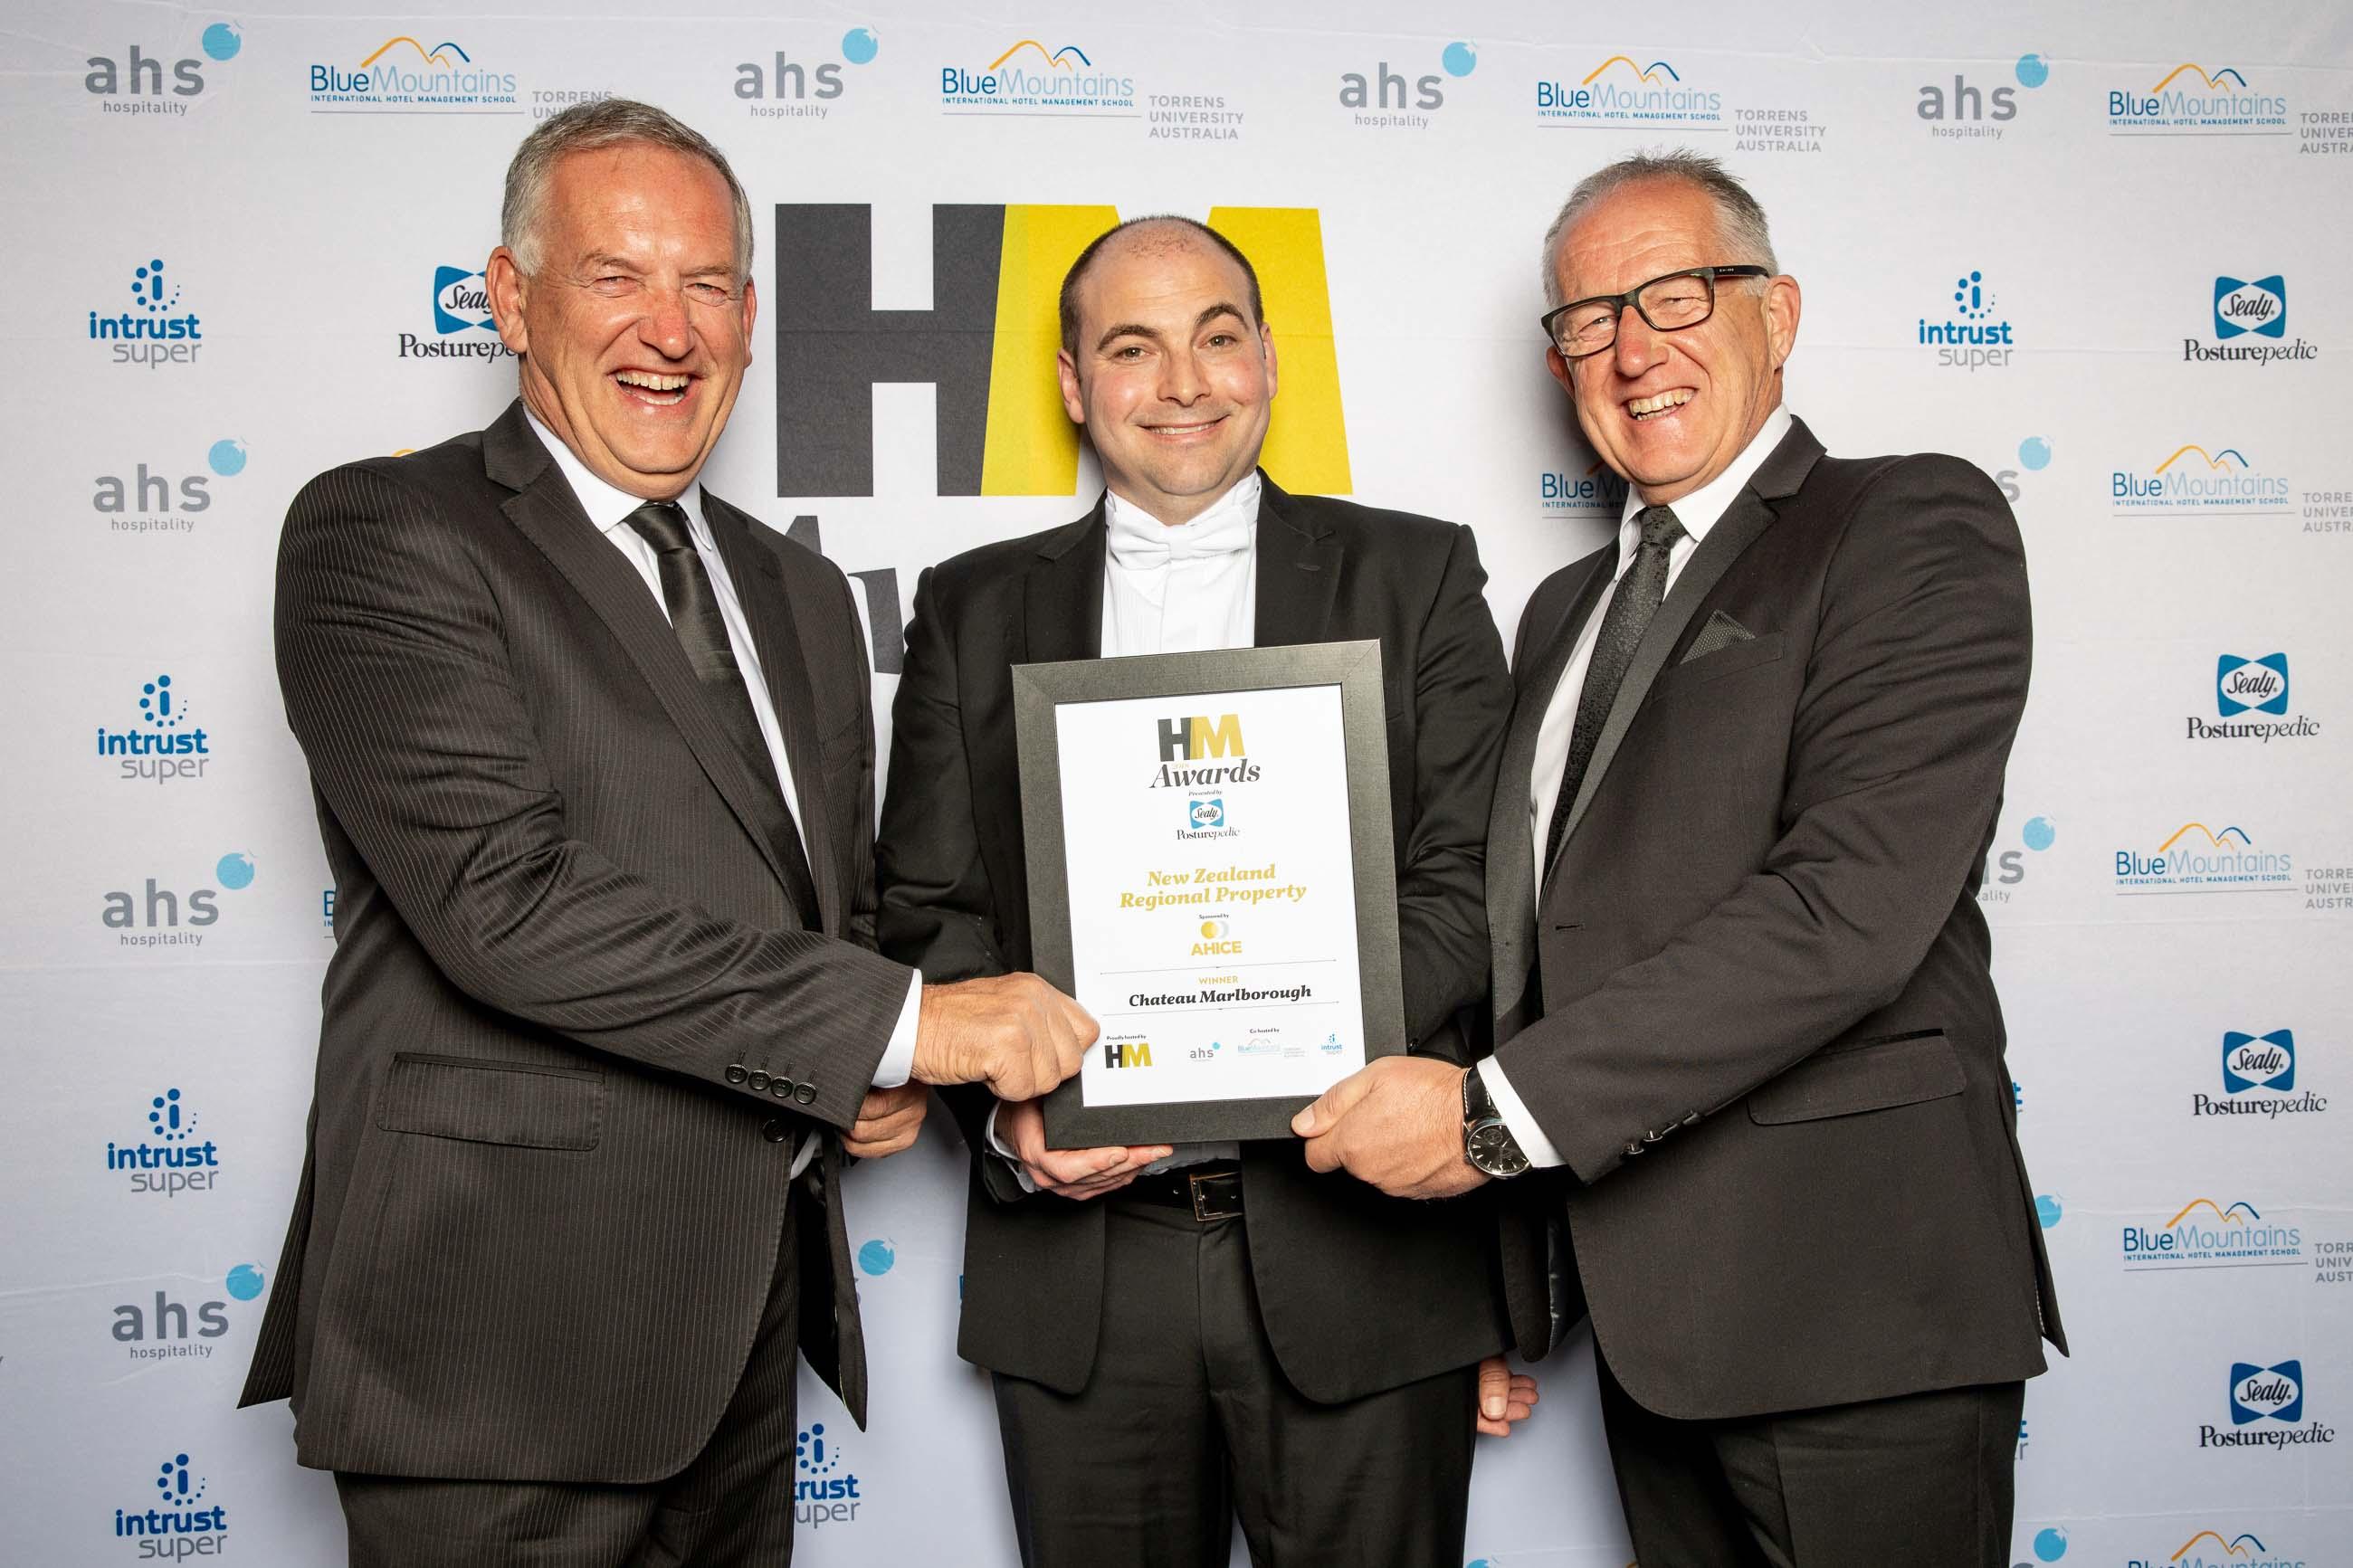 72ppi-HMawards-2018-official-award-wall-128128